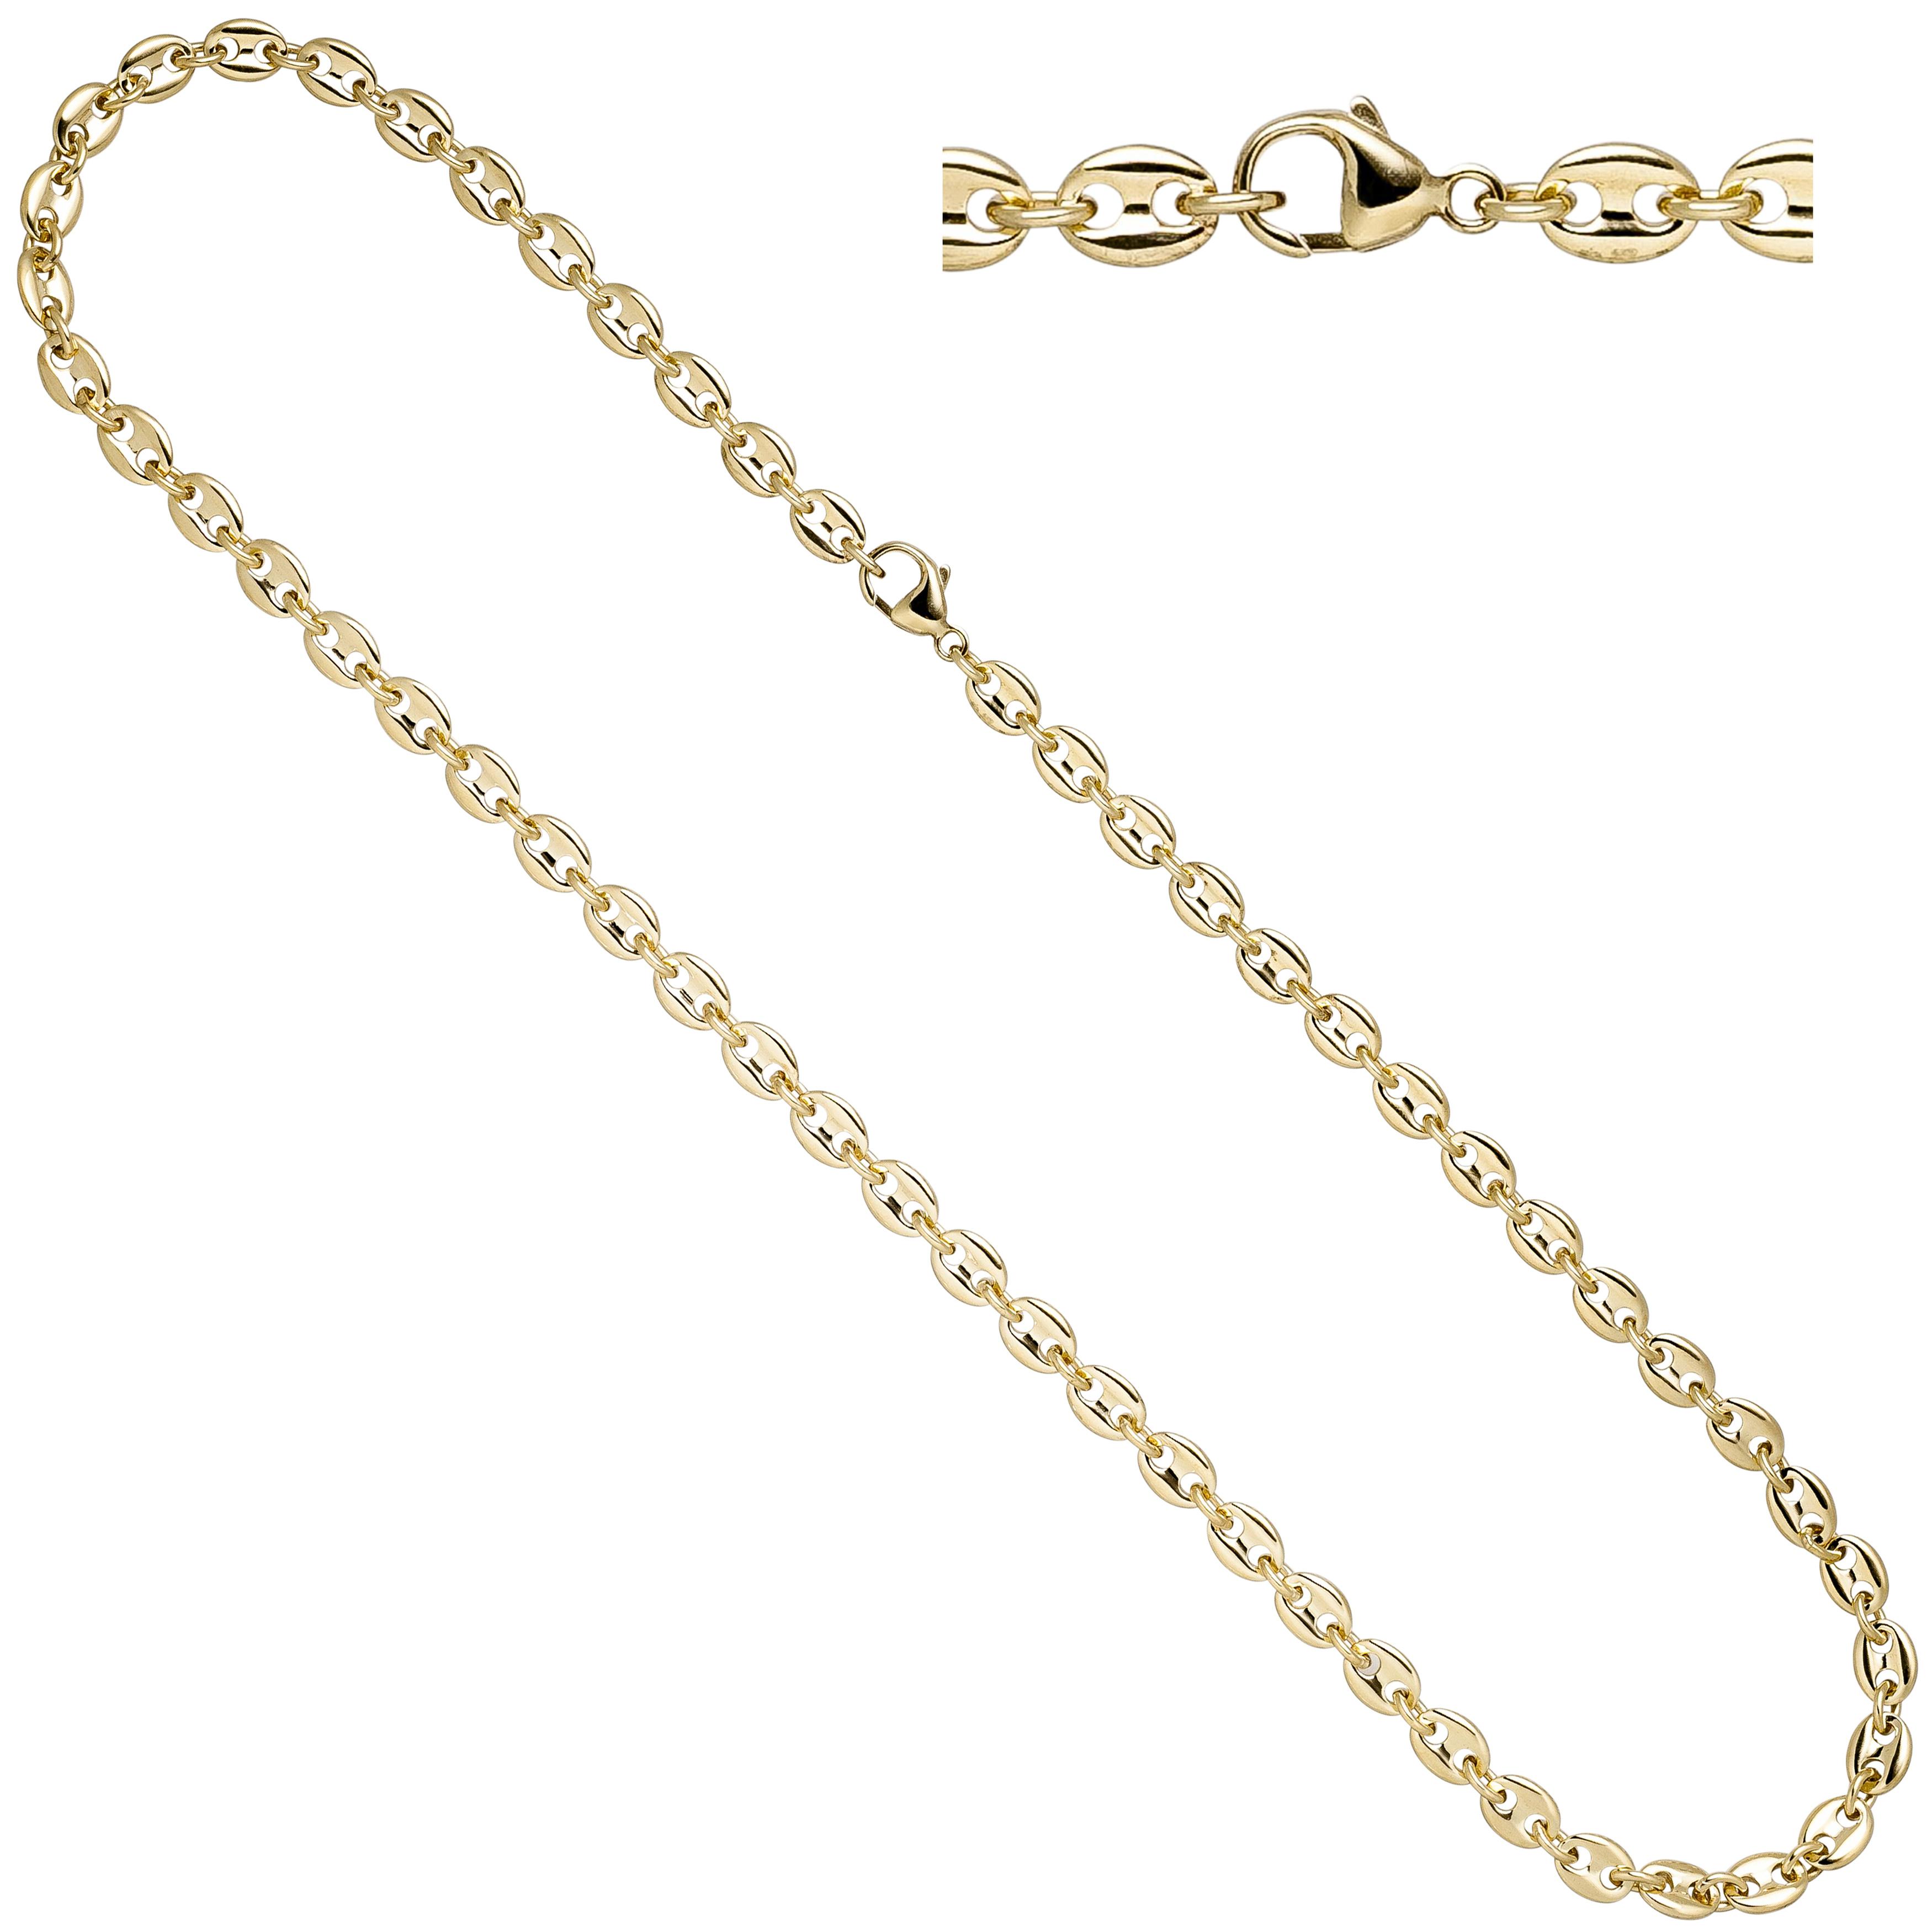 Halskette Kaffeebohnen Kette 585 Gold Gelbgold 50 Cm Goldkette